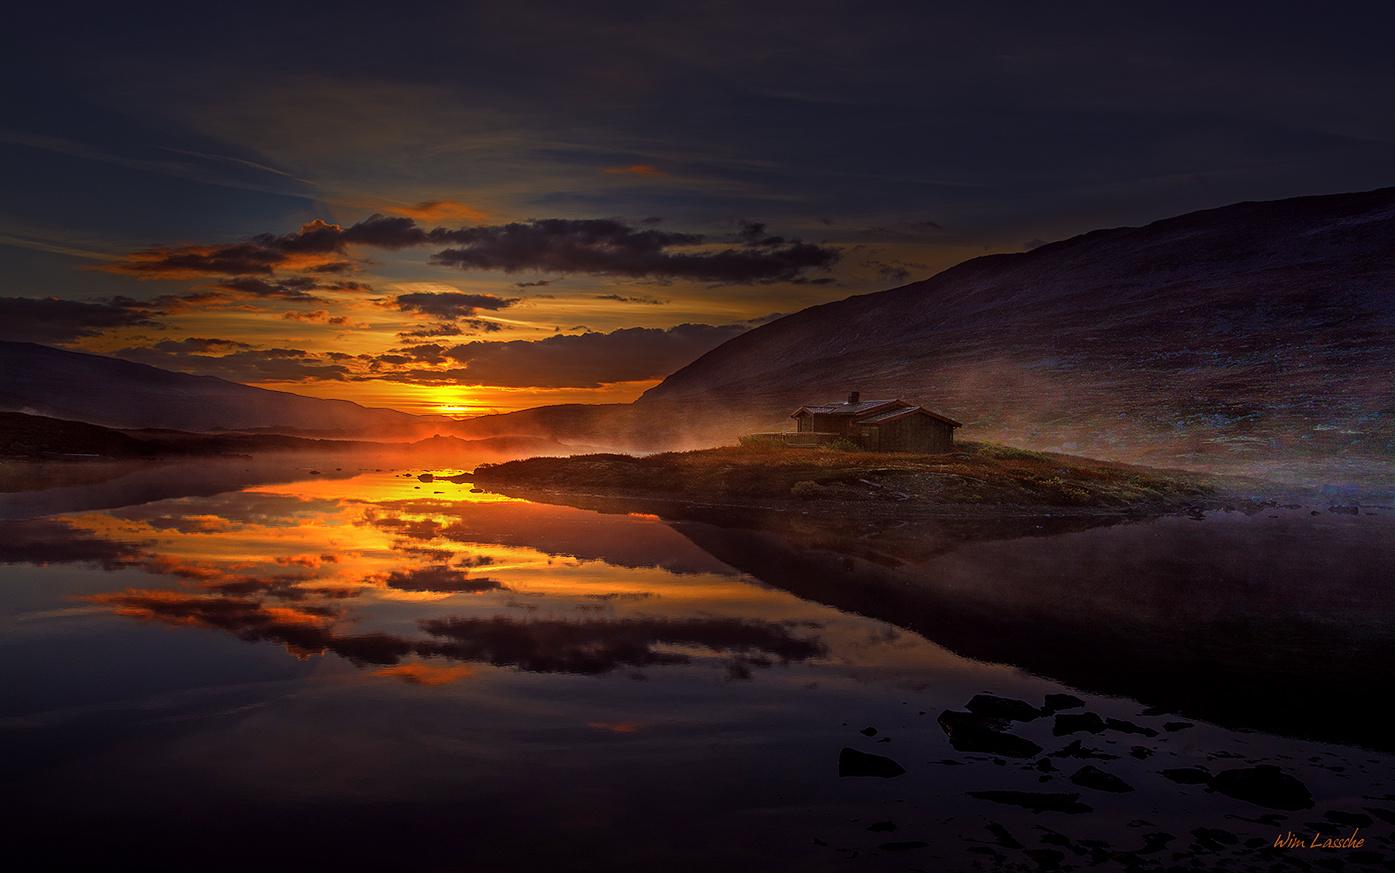 The Hut by Wim Lassche